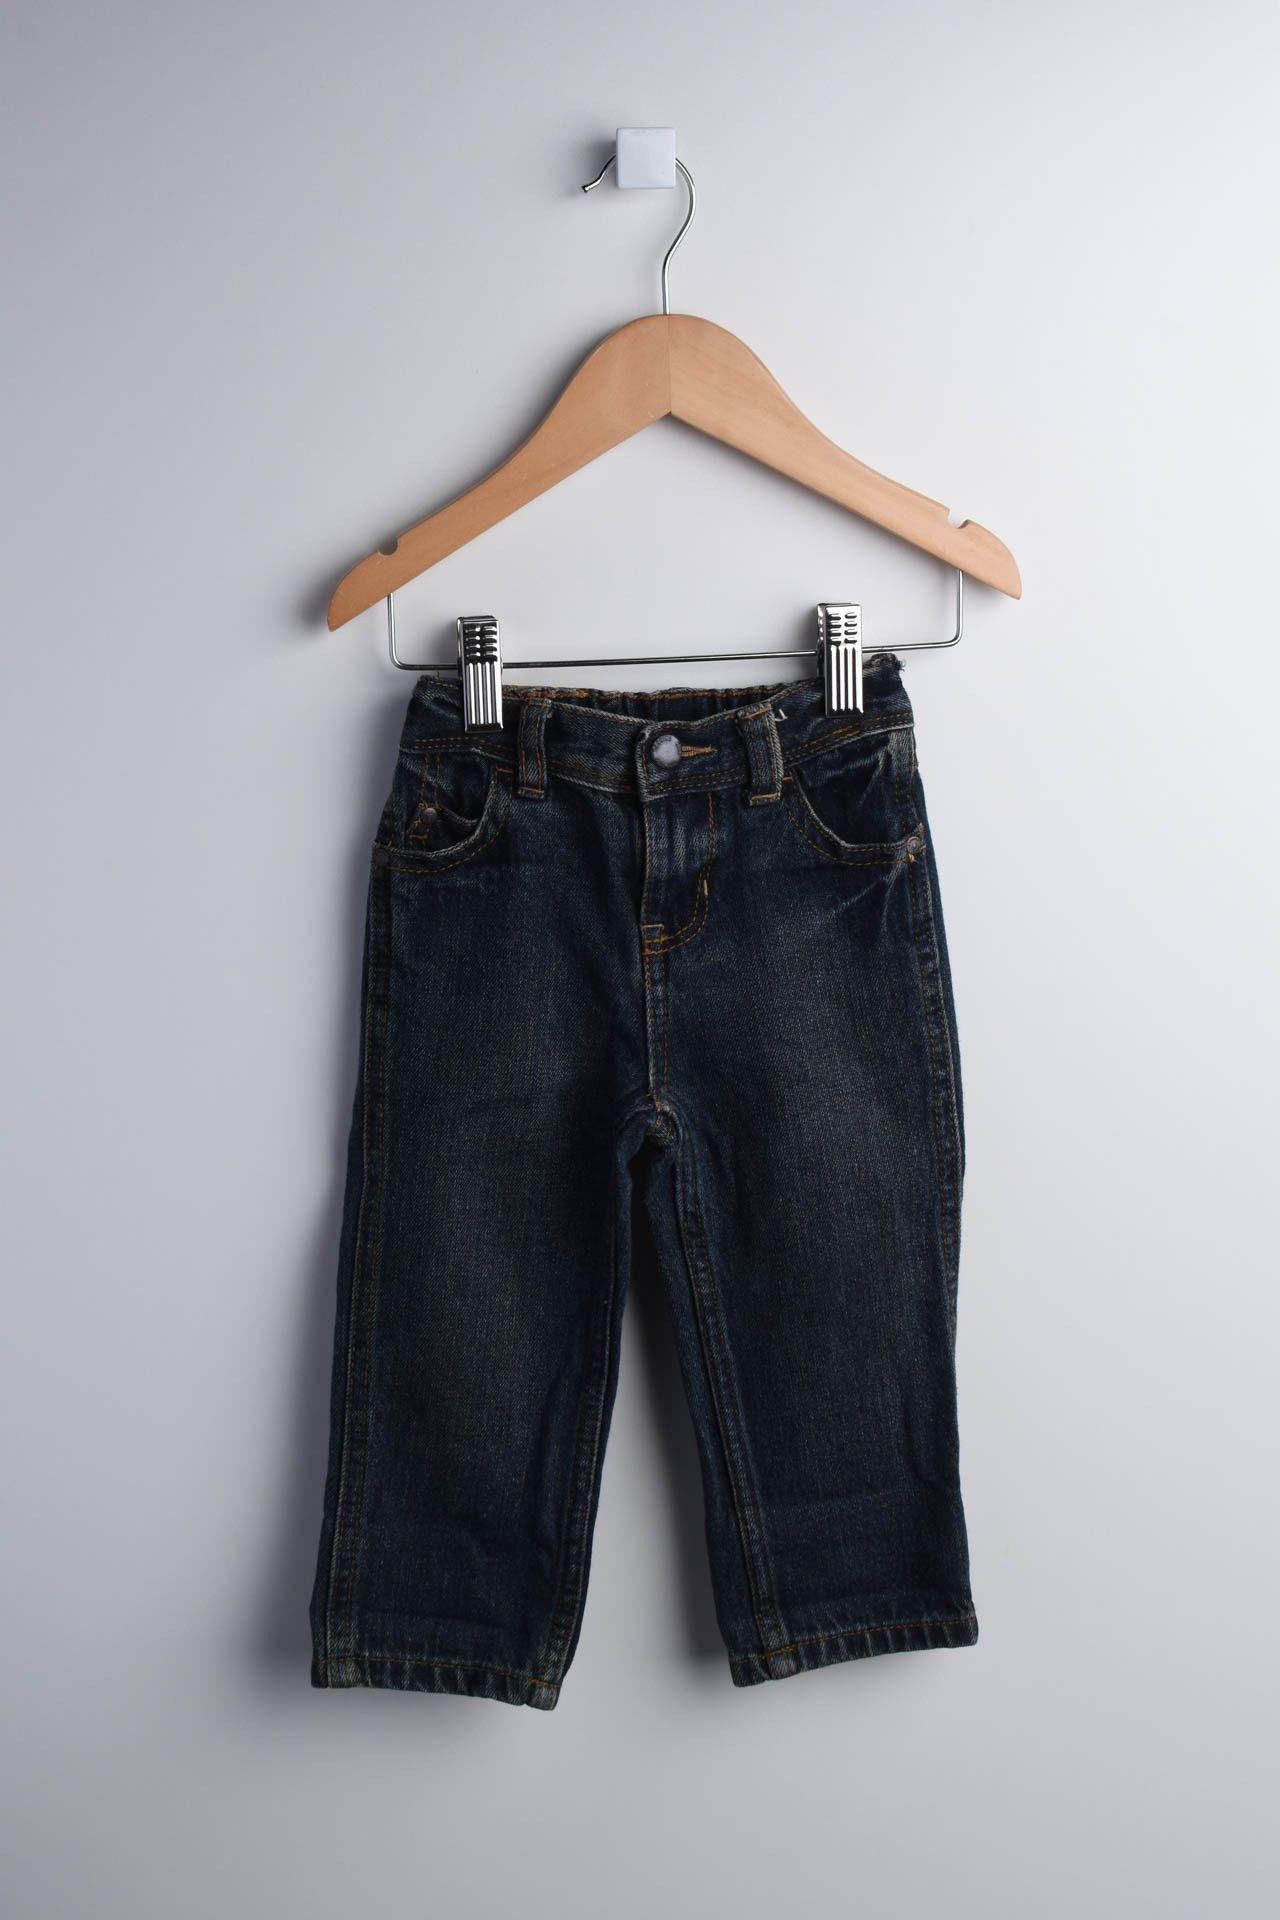 Oshkosh  - Calça Jeans Lavagem - Foto 1